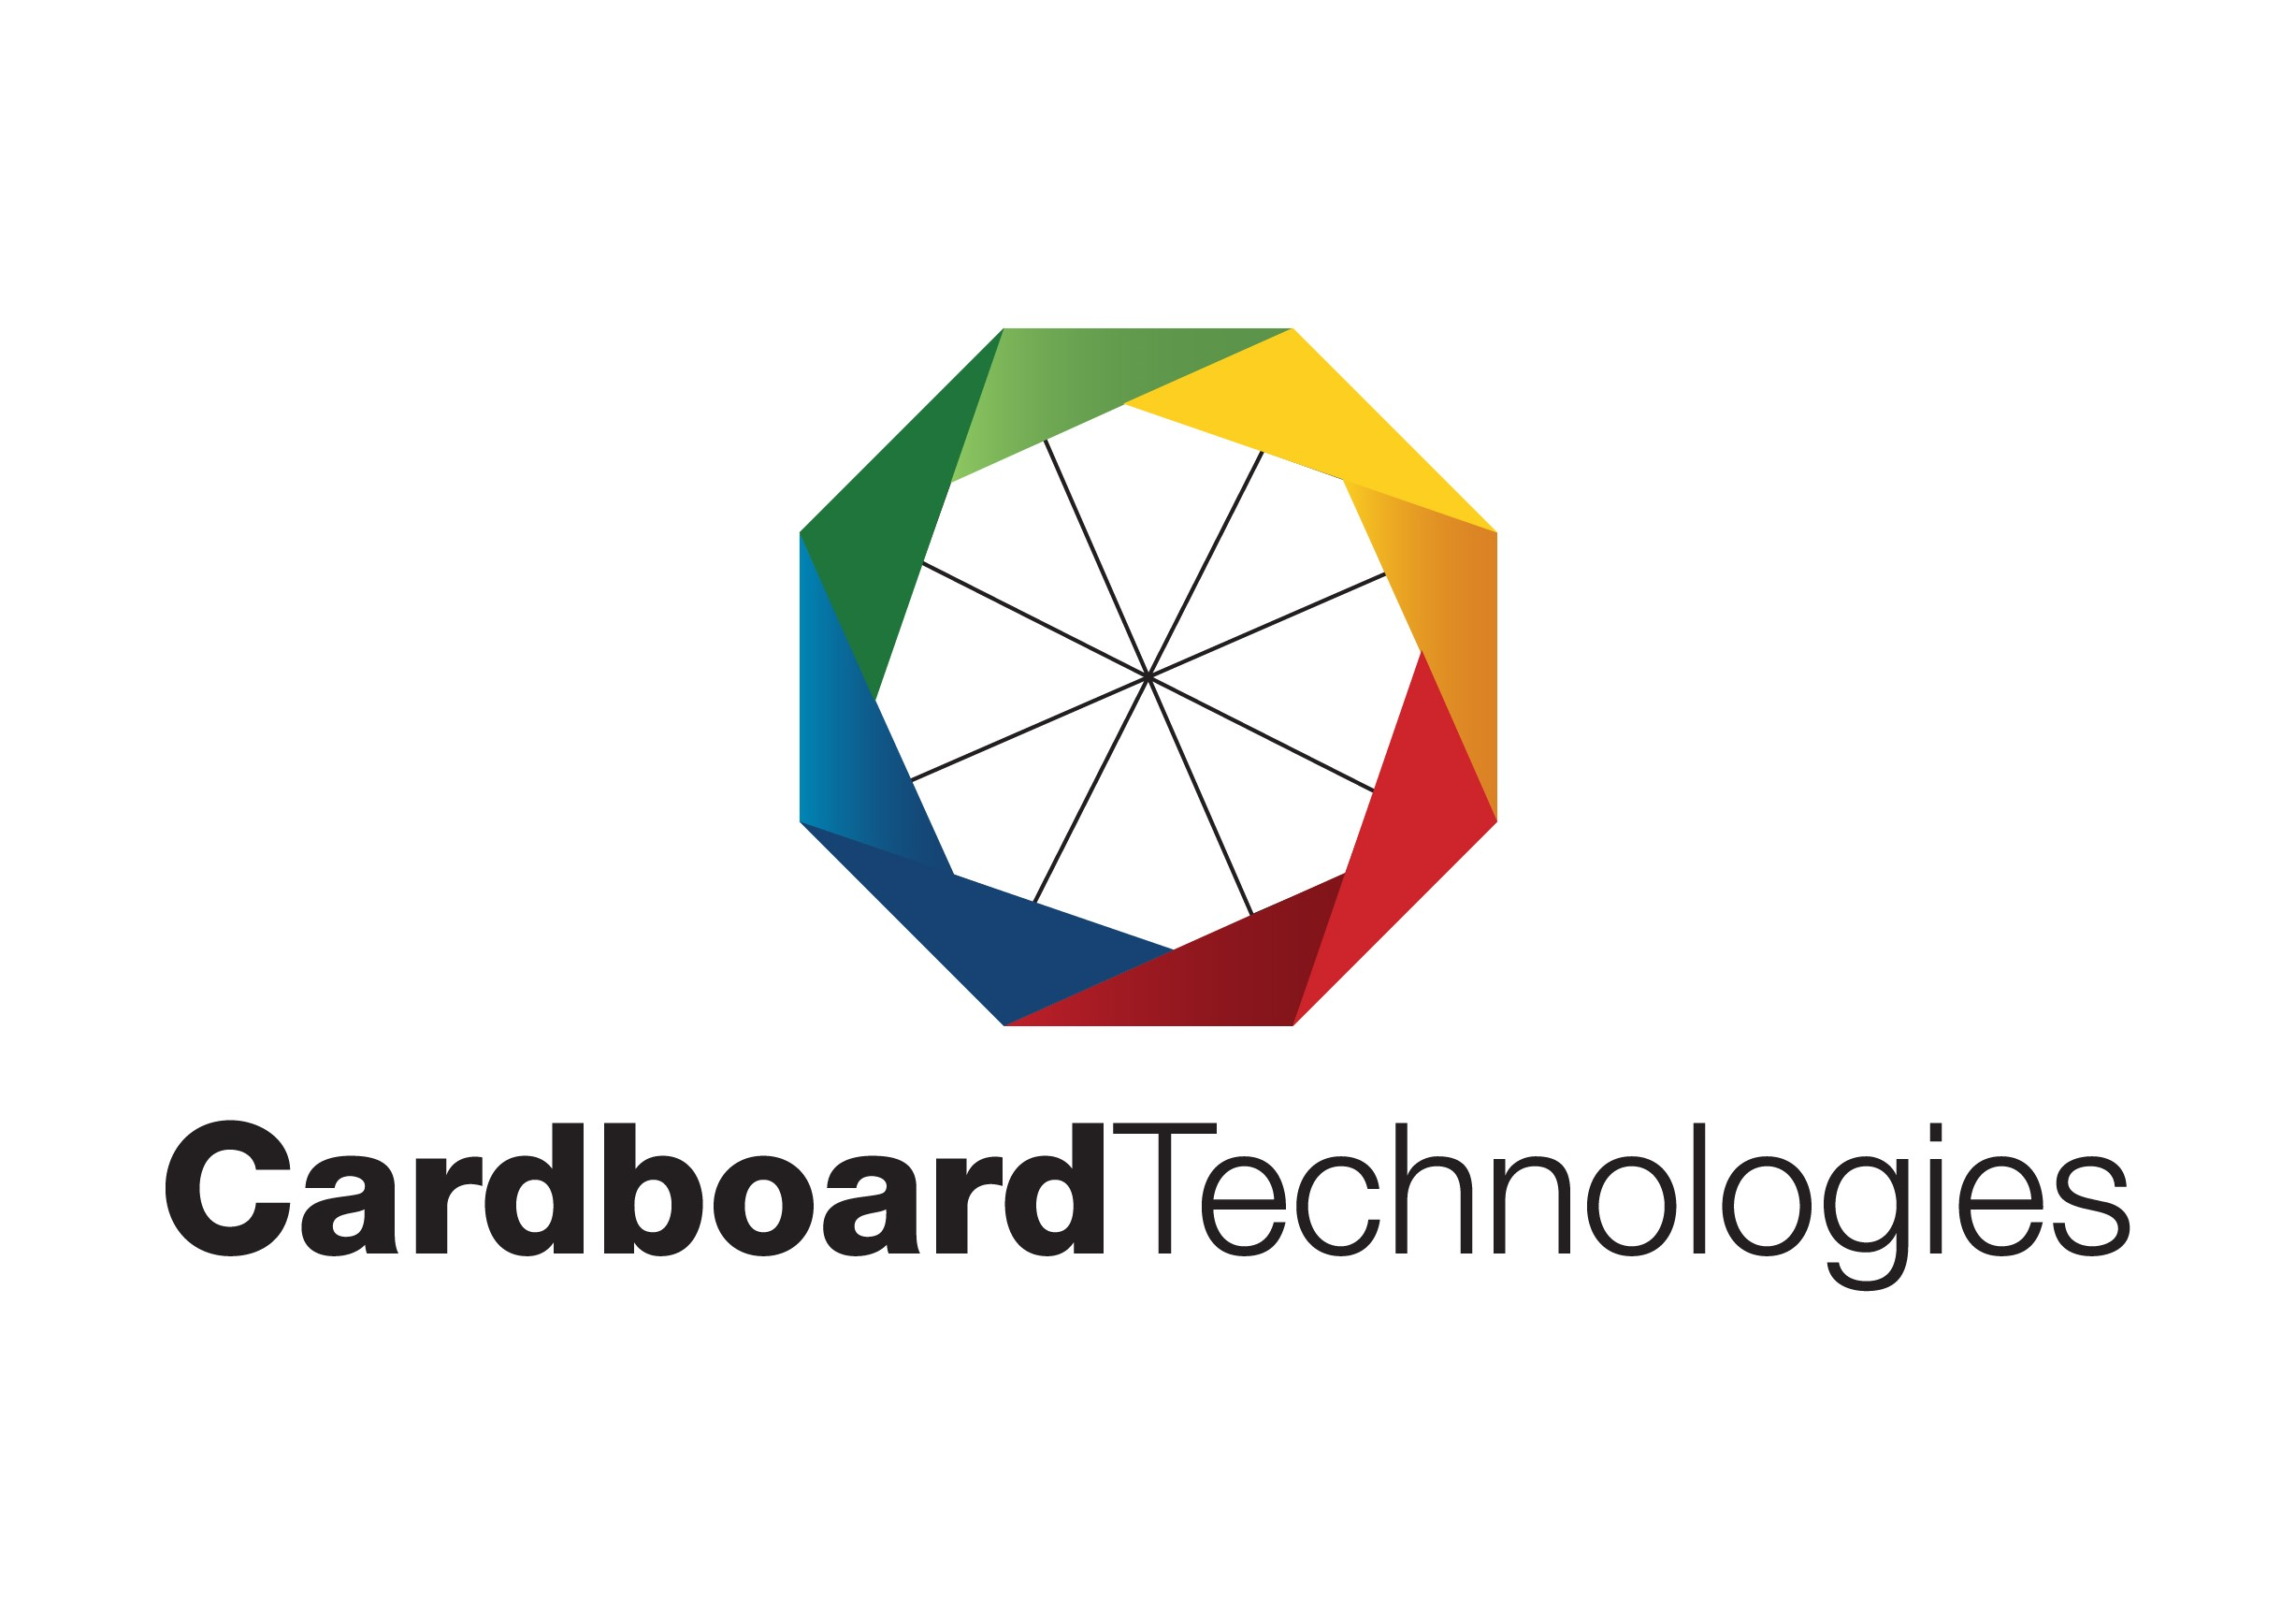 Cardboard Technologies